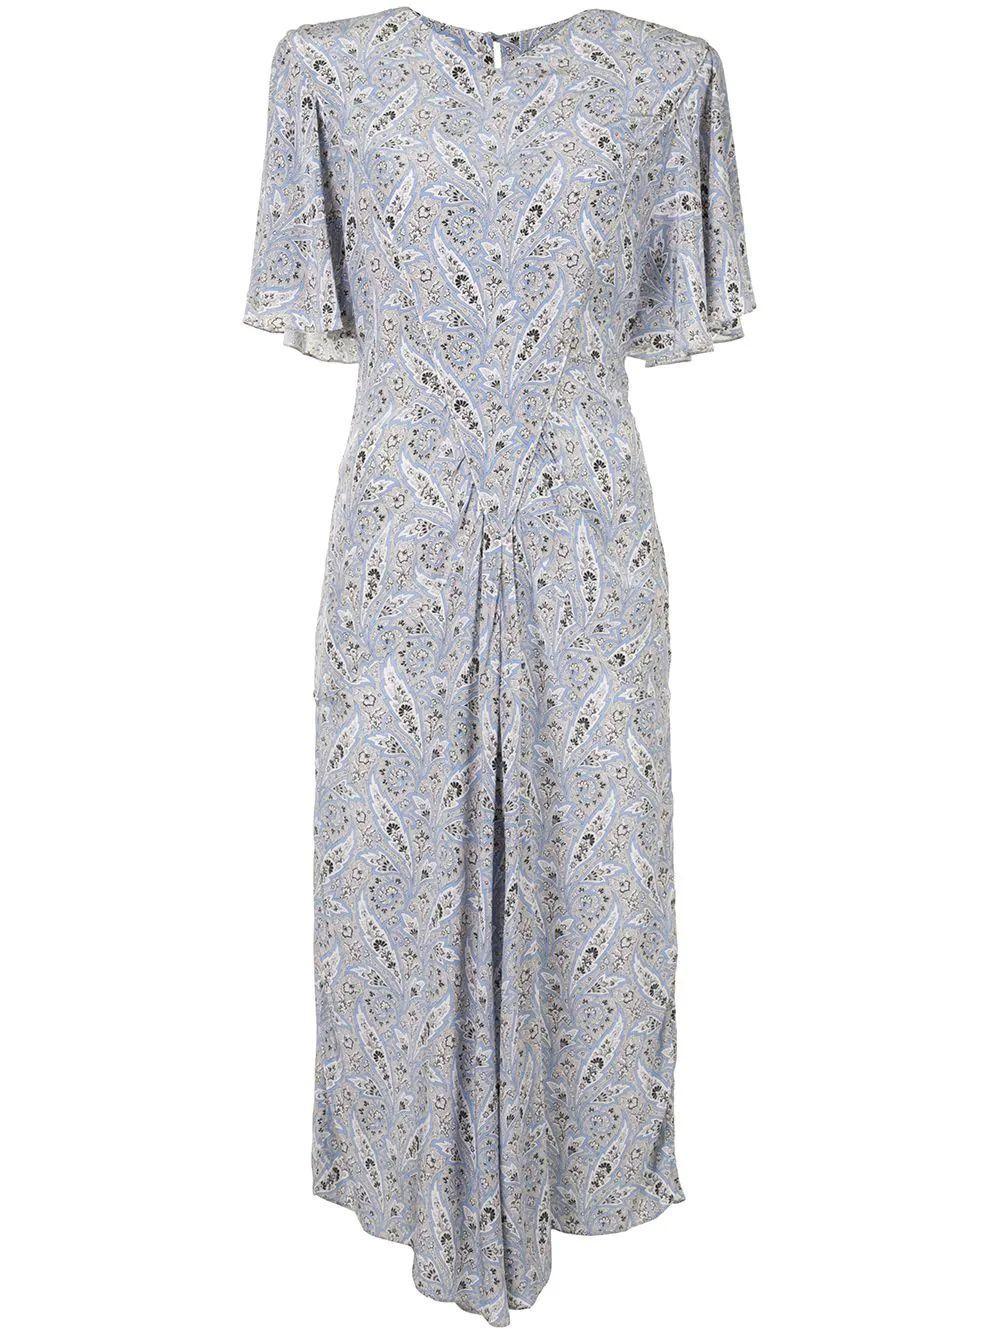 Berwick Printed Dress Item # BERWICK